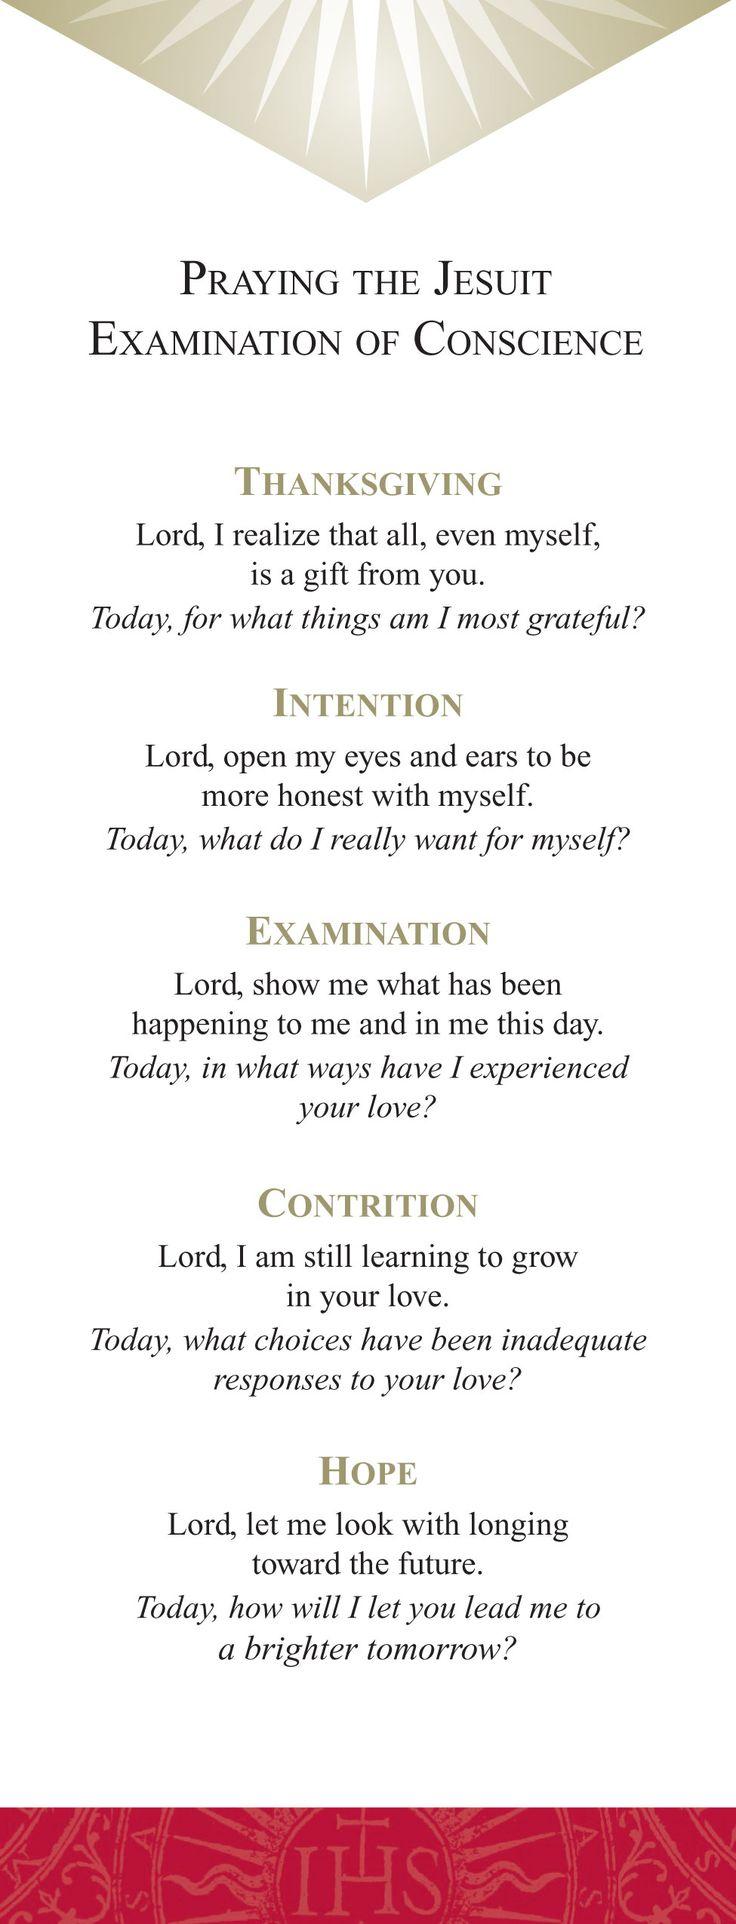 Ignatian examen prayer card - Google Search